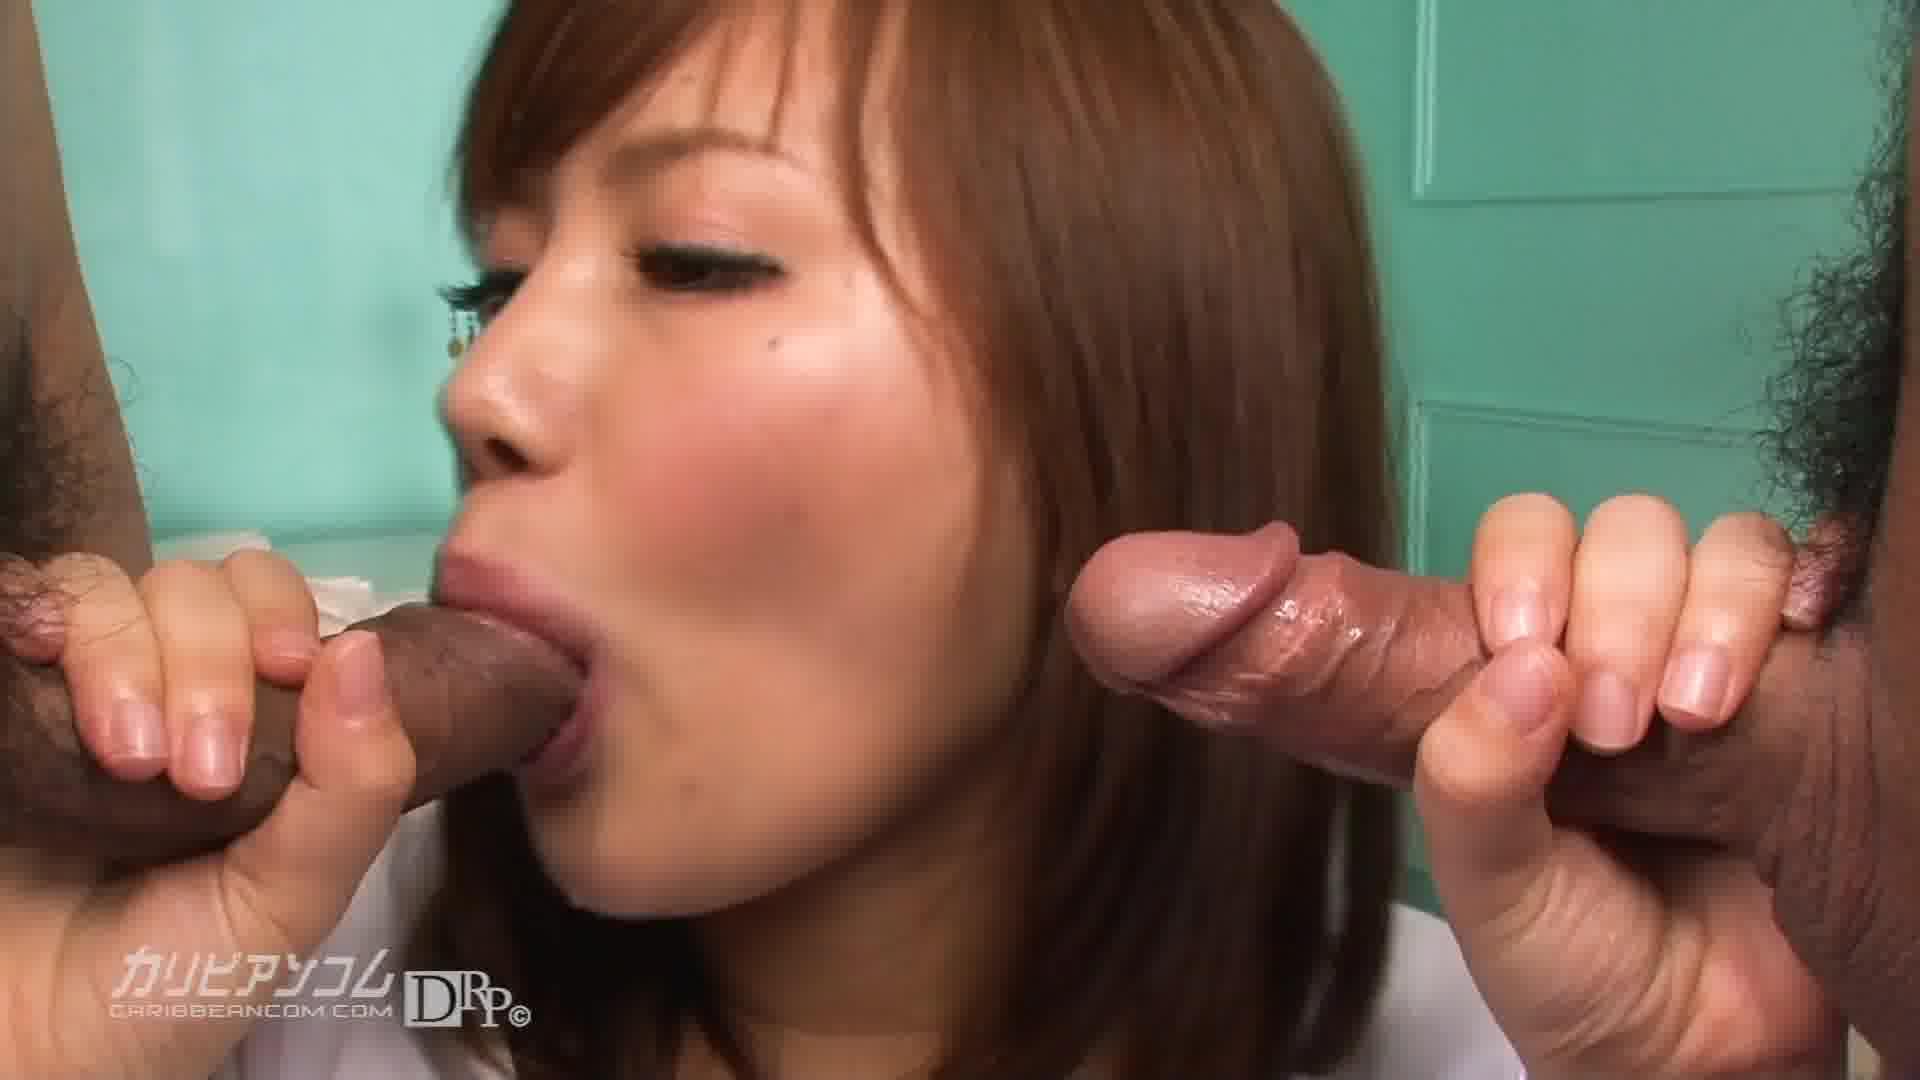 早抜き 水谷心音BEST 2 - 水谷心音【乱交・美乳・中出し】